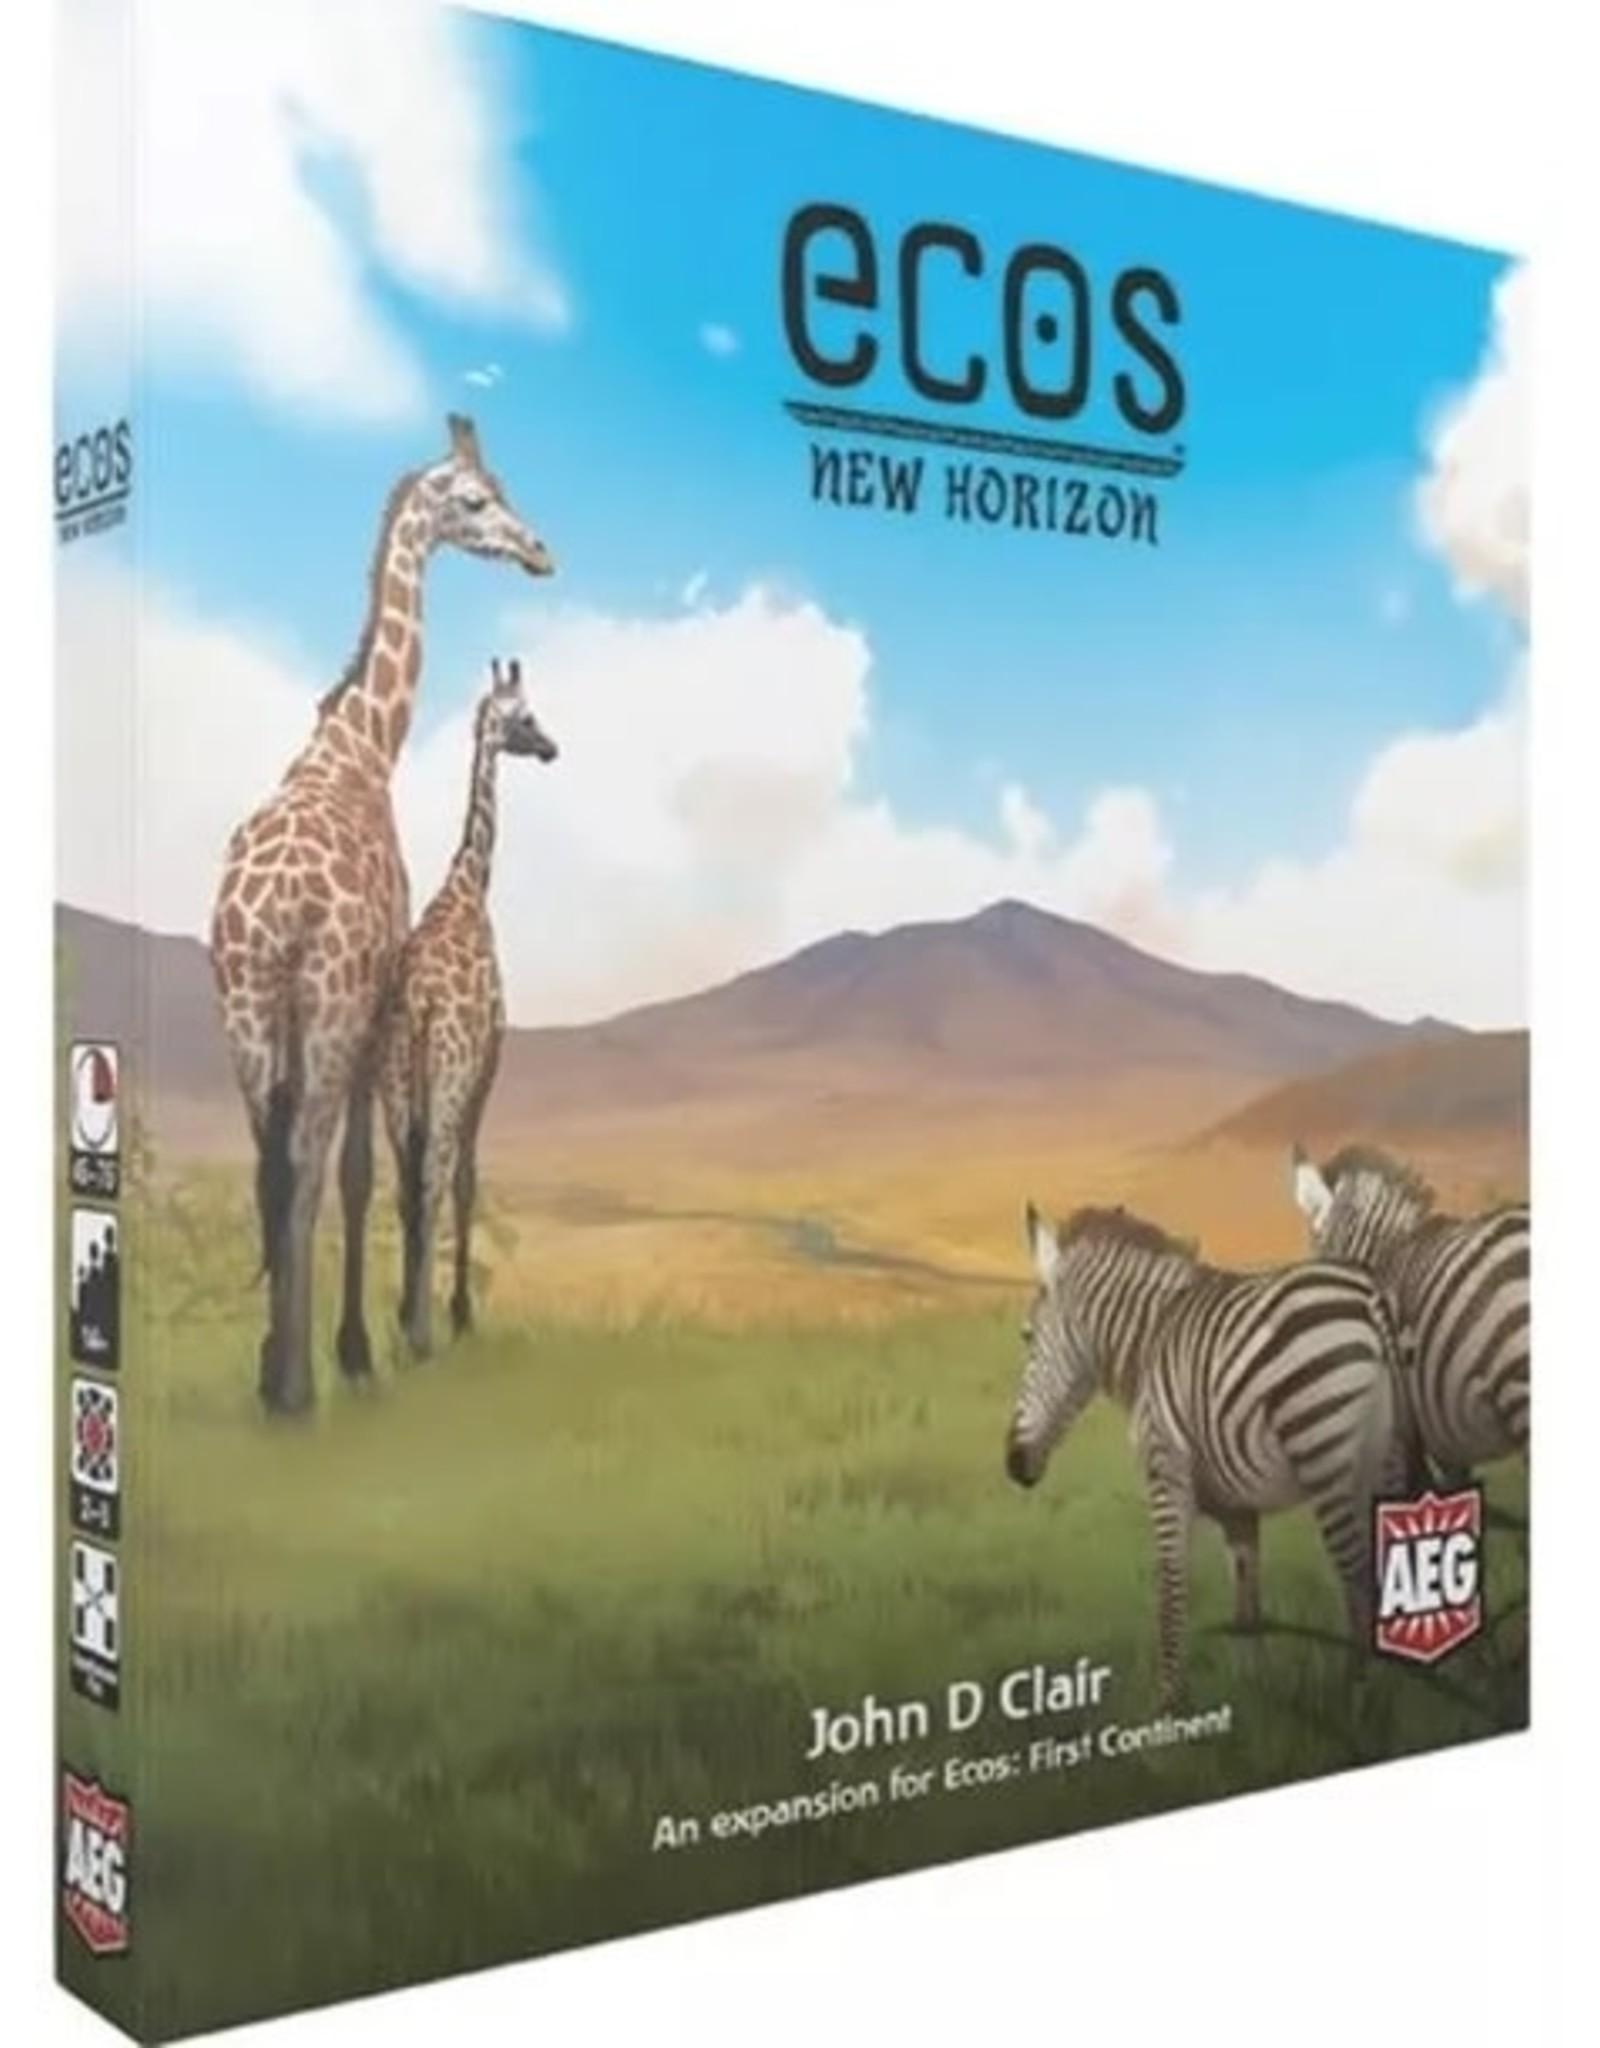 AEG Ecos: New Horizon